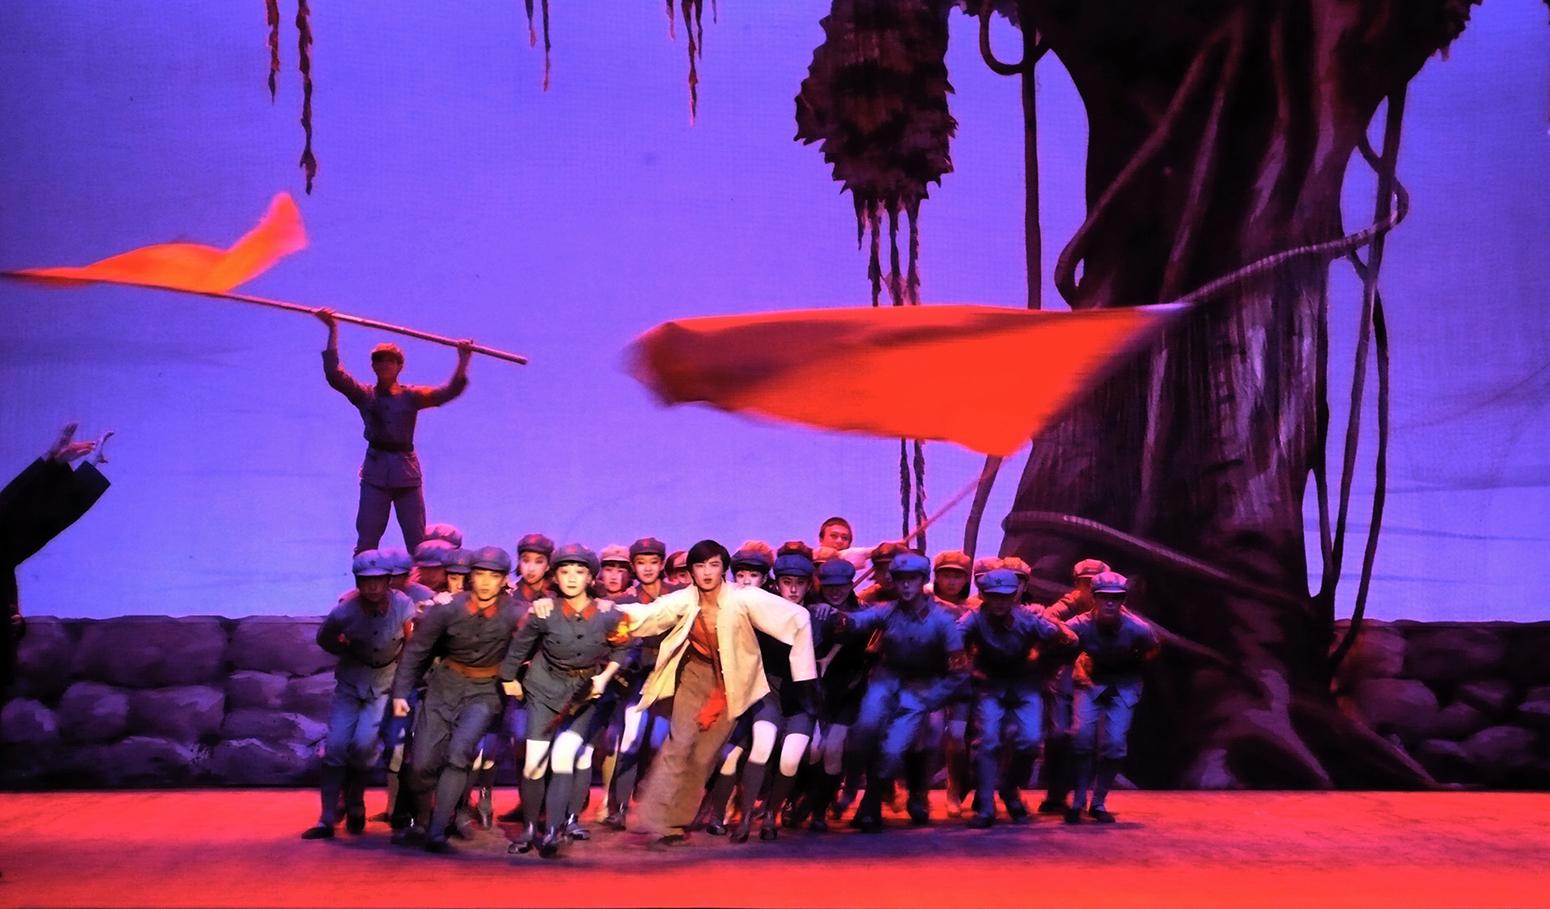 A scene from Mao's Last Dancer. (Credit: Peter James)